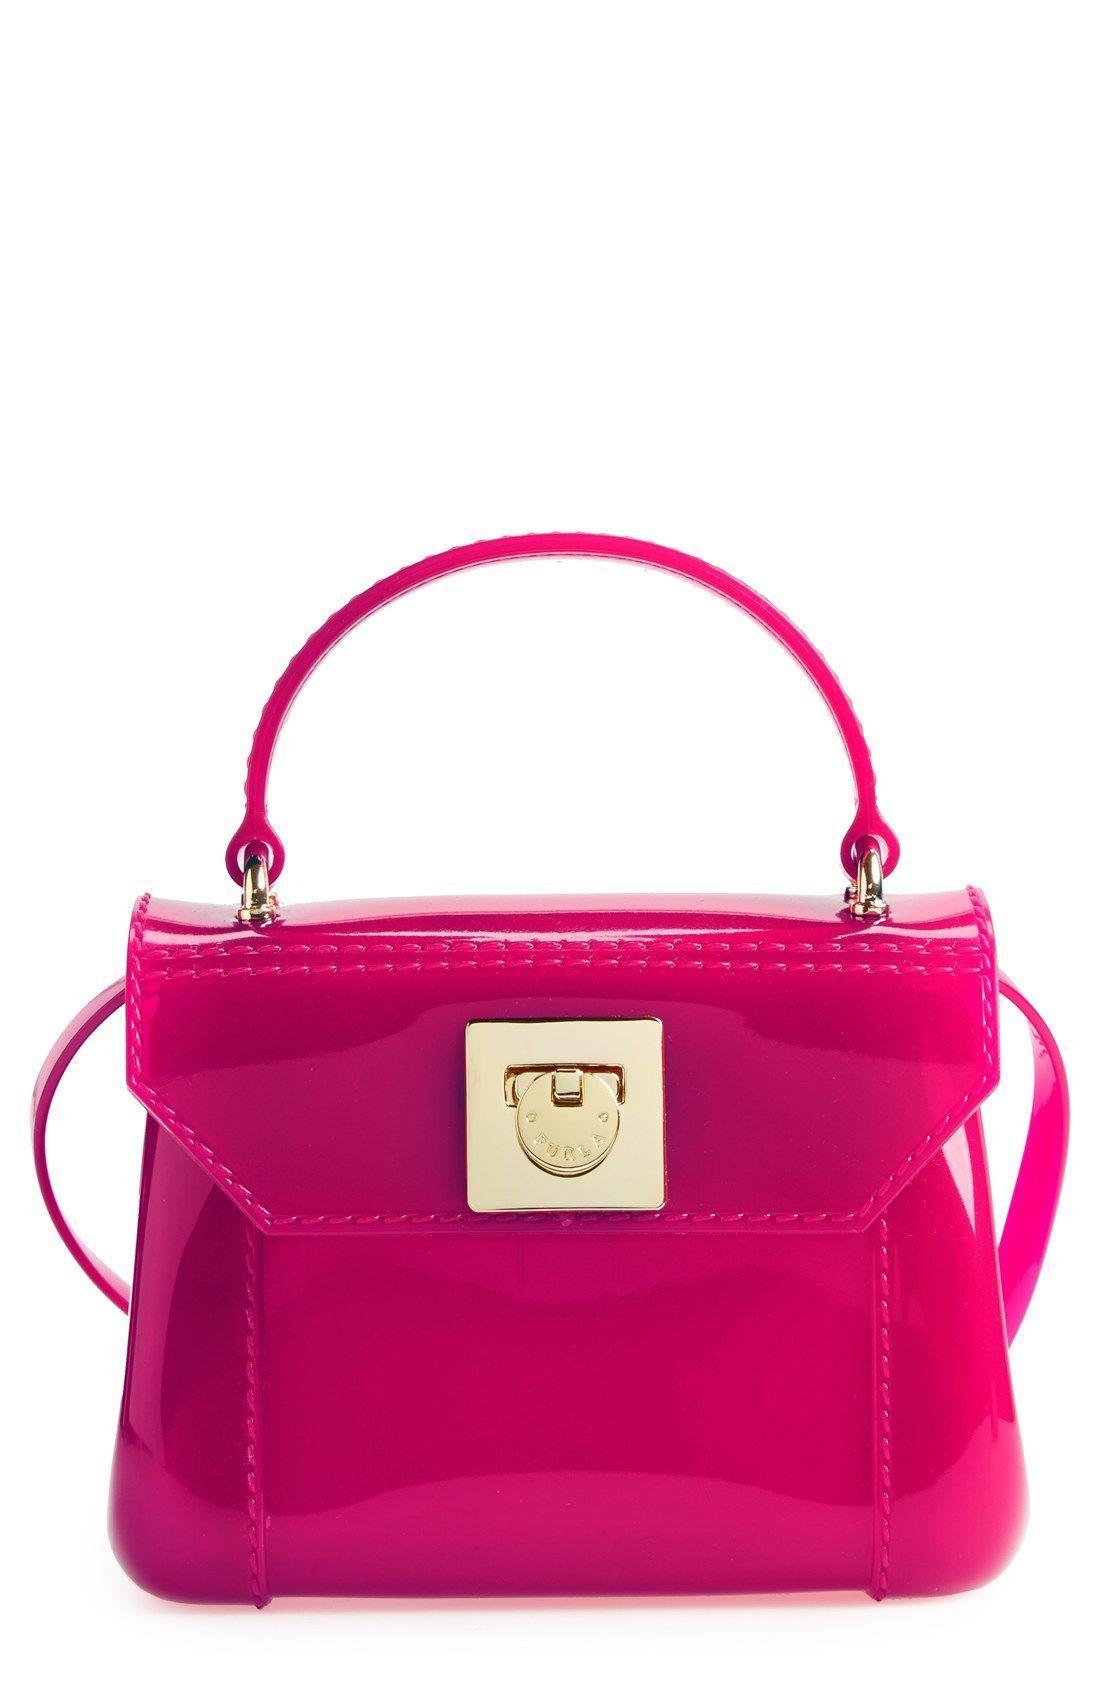 9623ac76b60f Love how vibrant this pink candy crossbody bag is!  furlahandbags ...